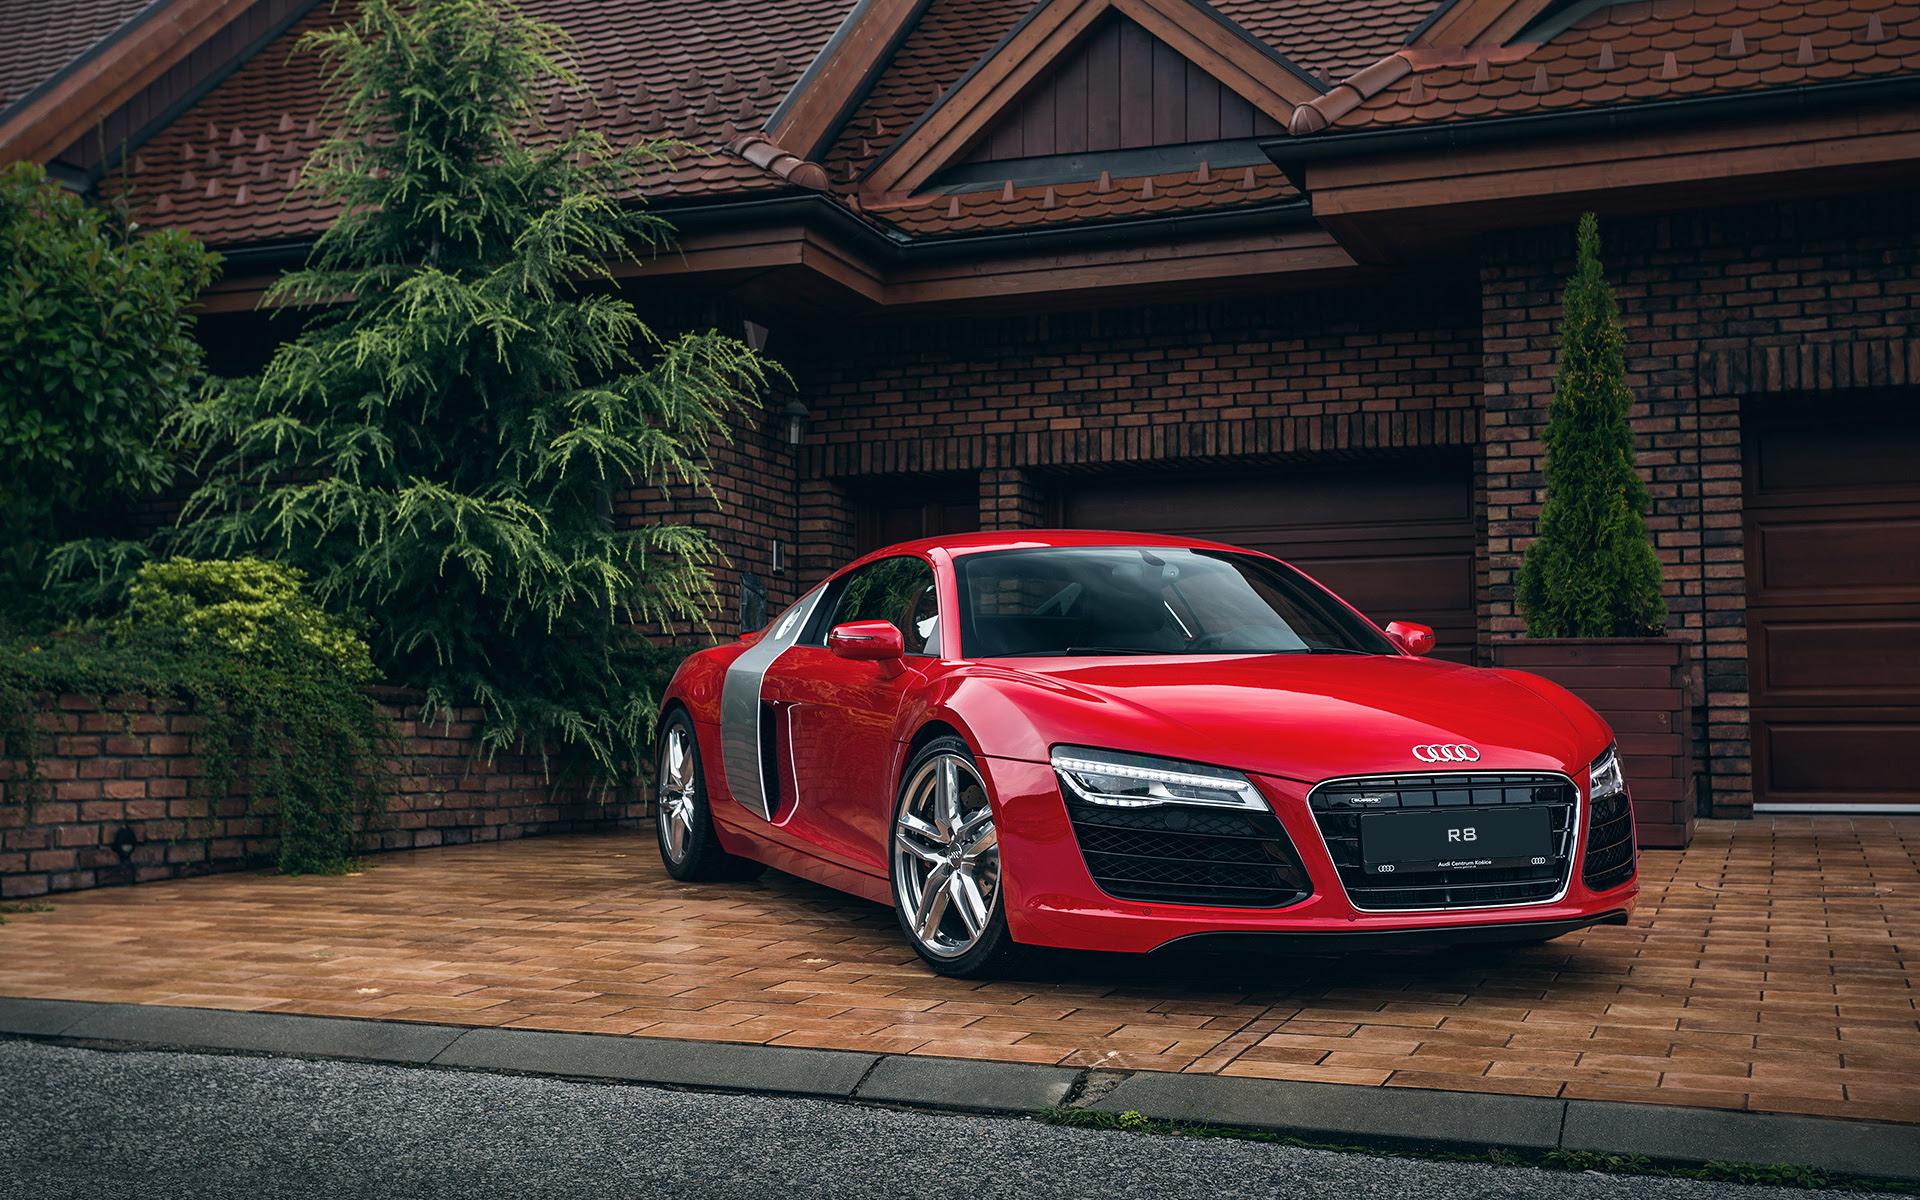 Audi R8 Red Wallpaper   HD Car Wallpapers   ID #5501